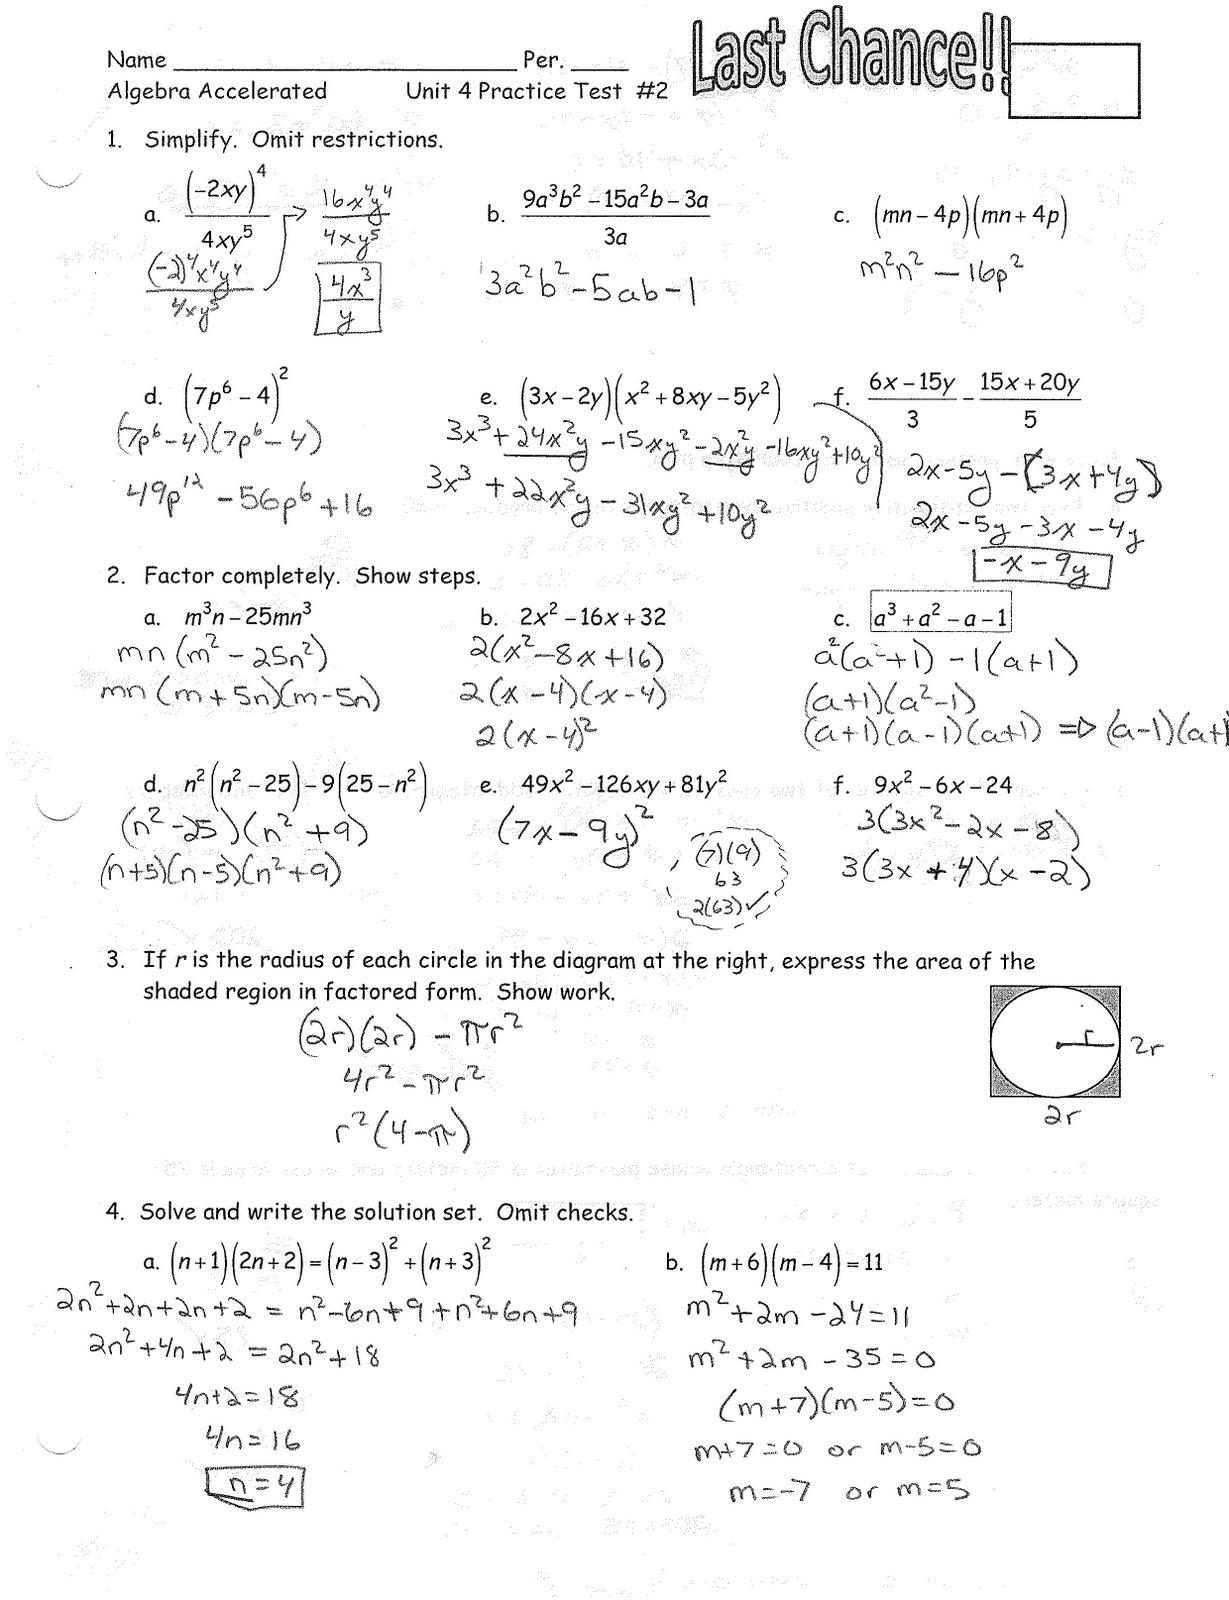 Iroquois Algebra Blog Unit 4 Practice Test 2 Answer Key